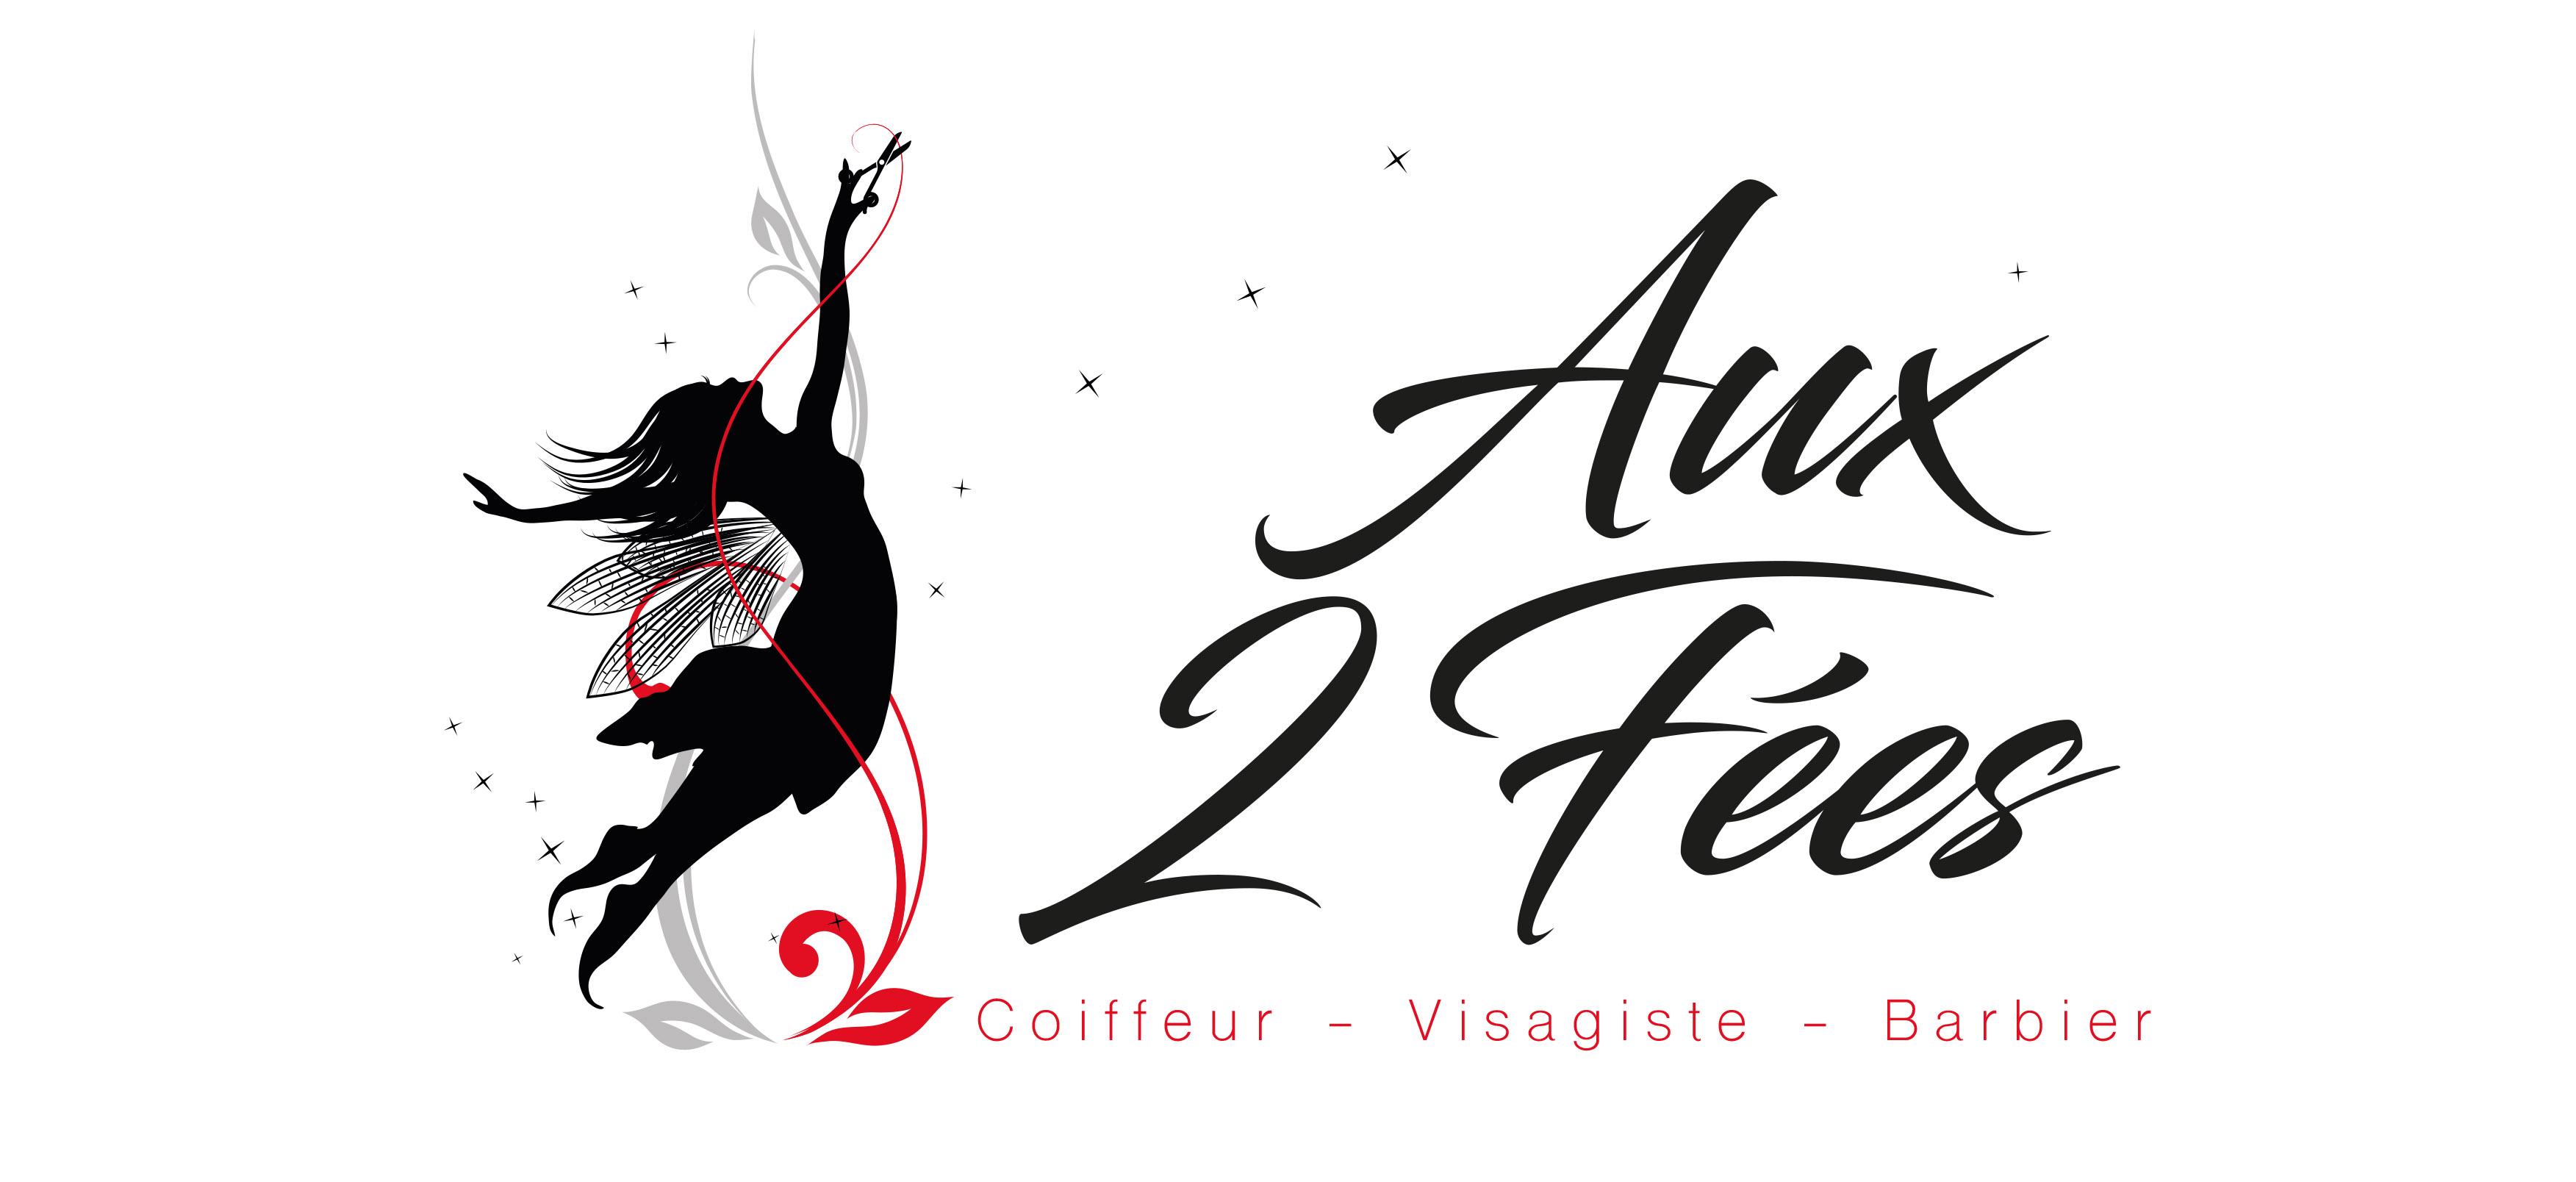 A2F-logo1